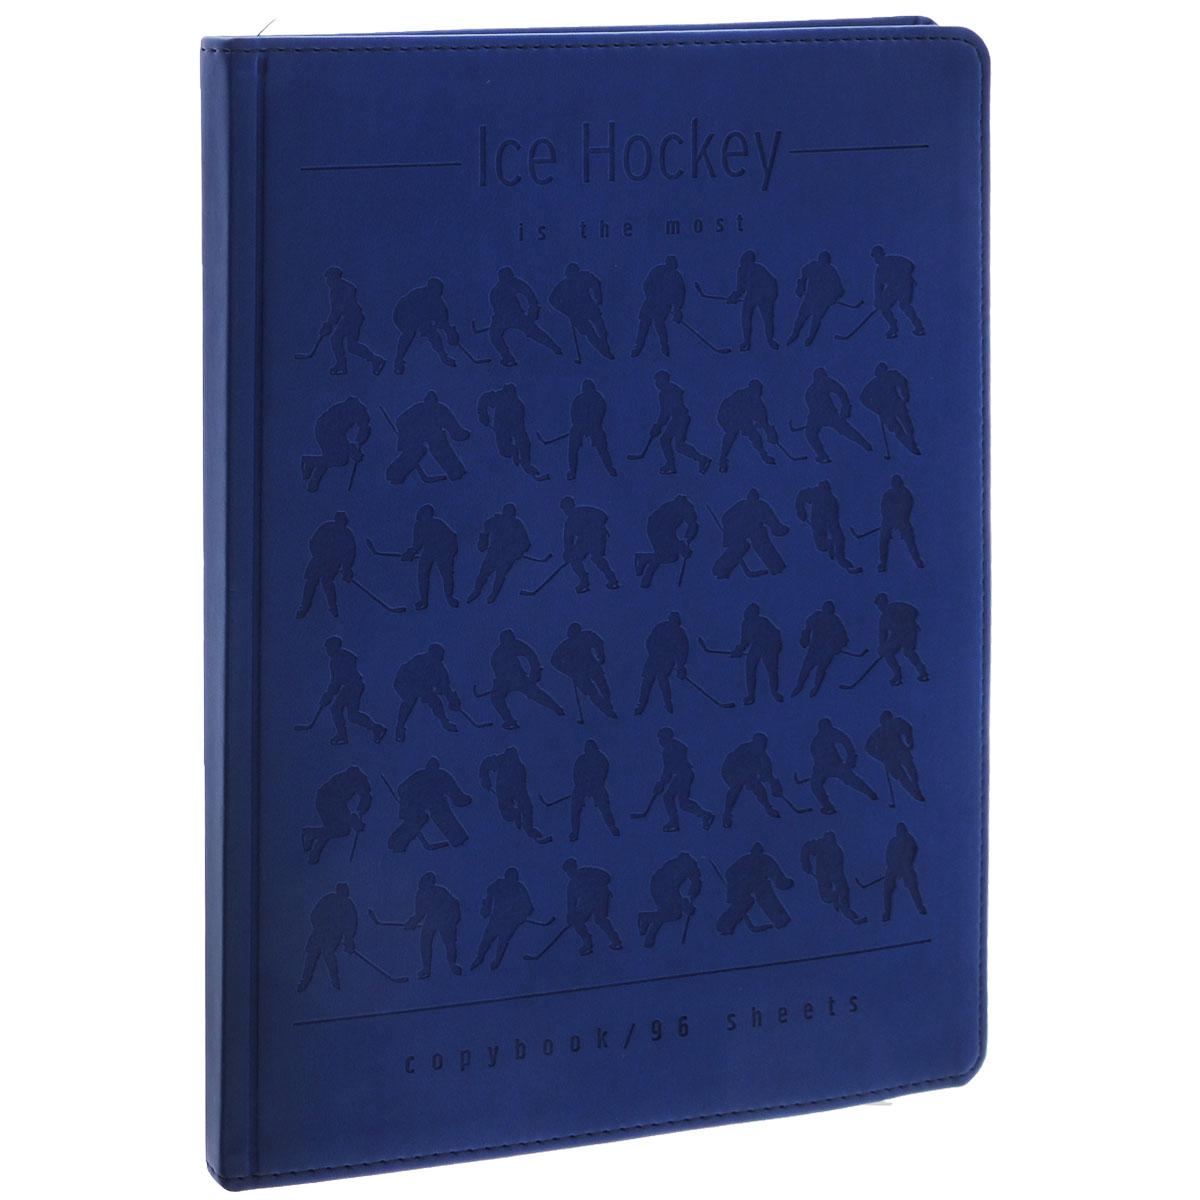 Тетрадь Альт Ice Hockey, 96 листов, формат А5, цвет: синий7-96-968